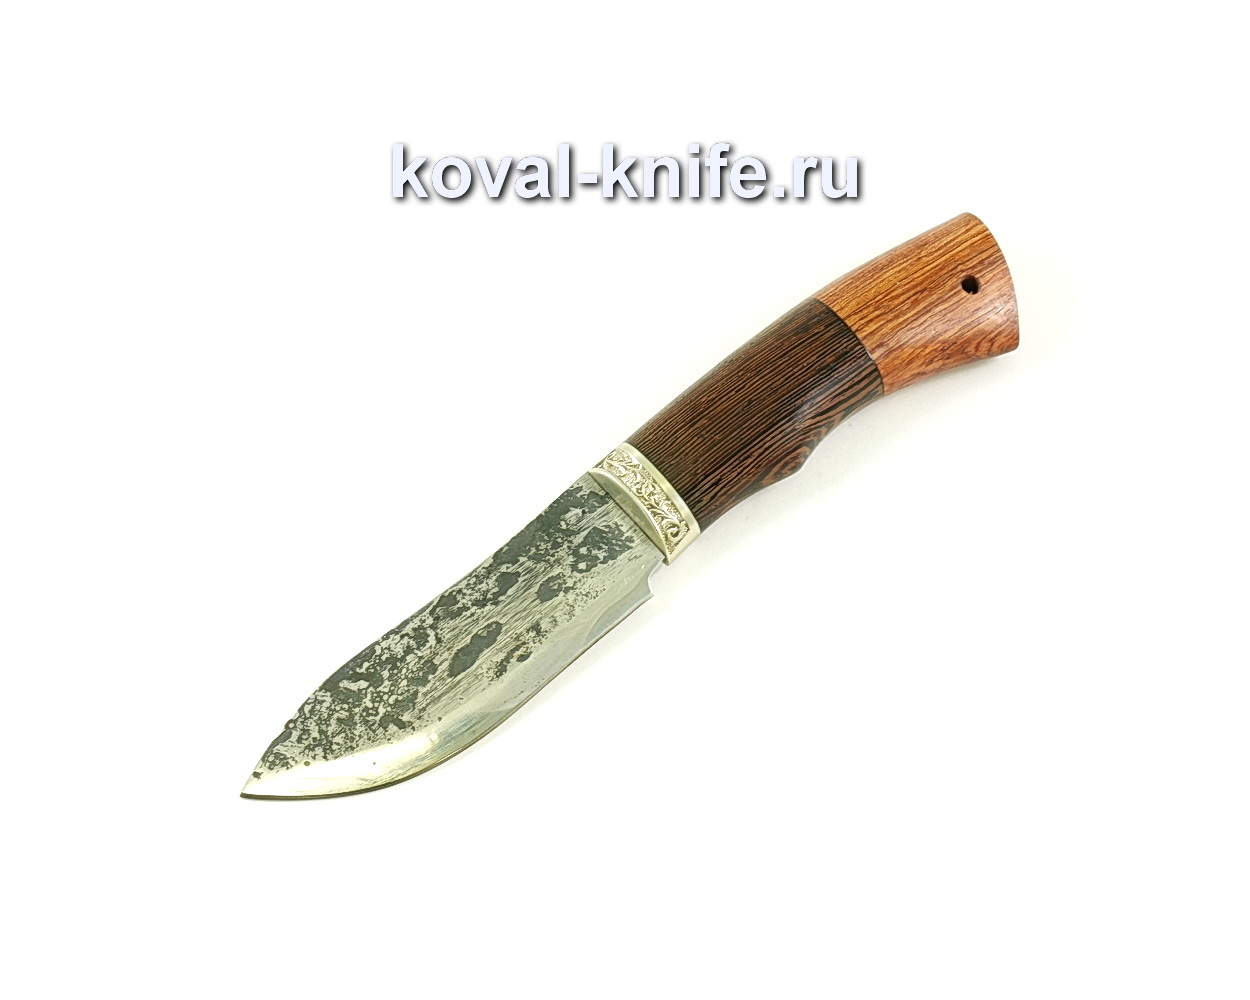 Нож Кабан (сталь 9хс), рукоять венге, бубинга, мельхиор